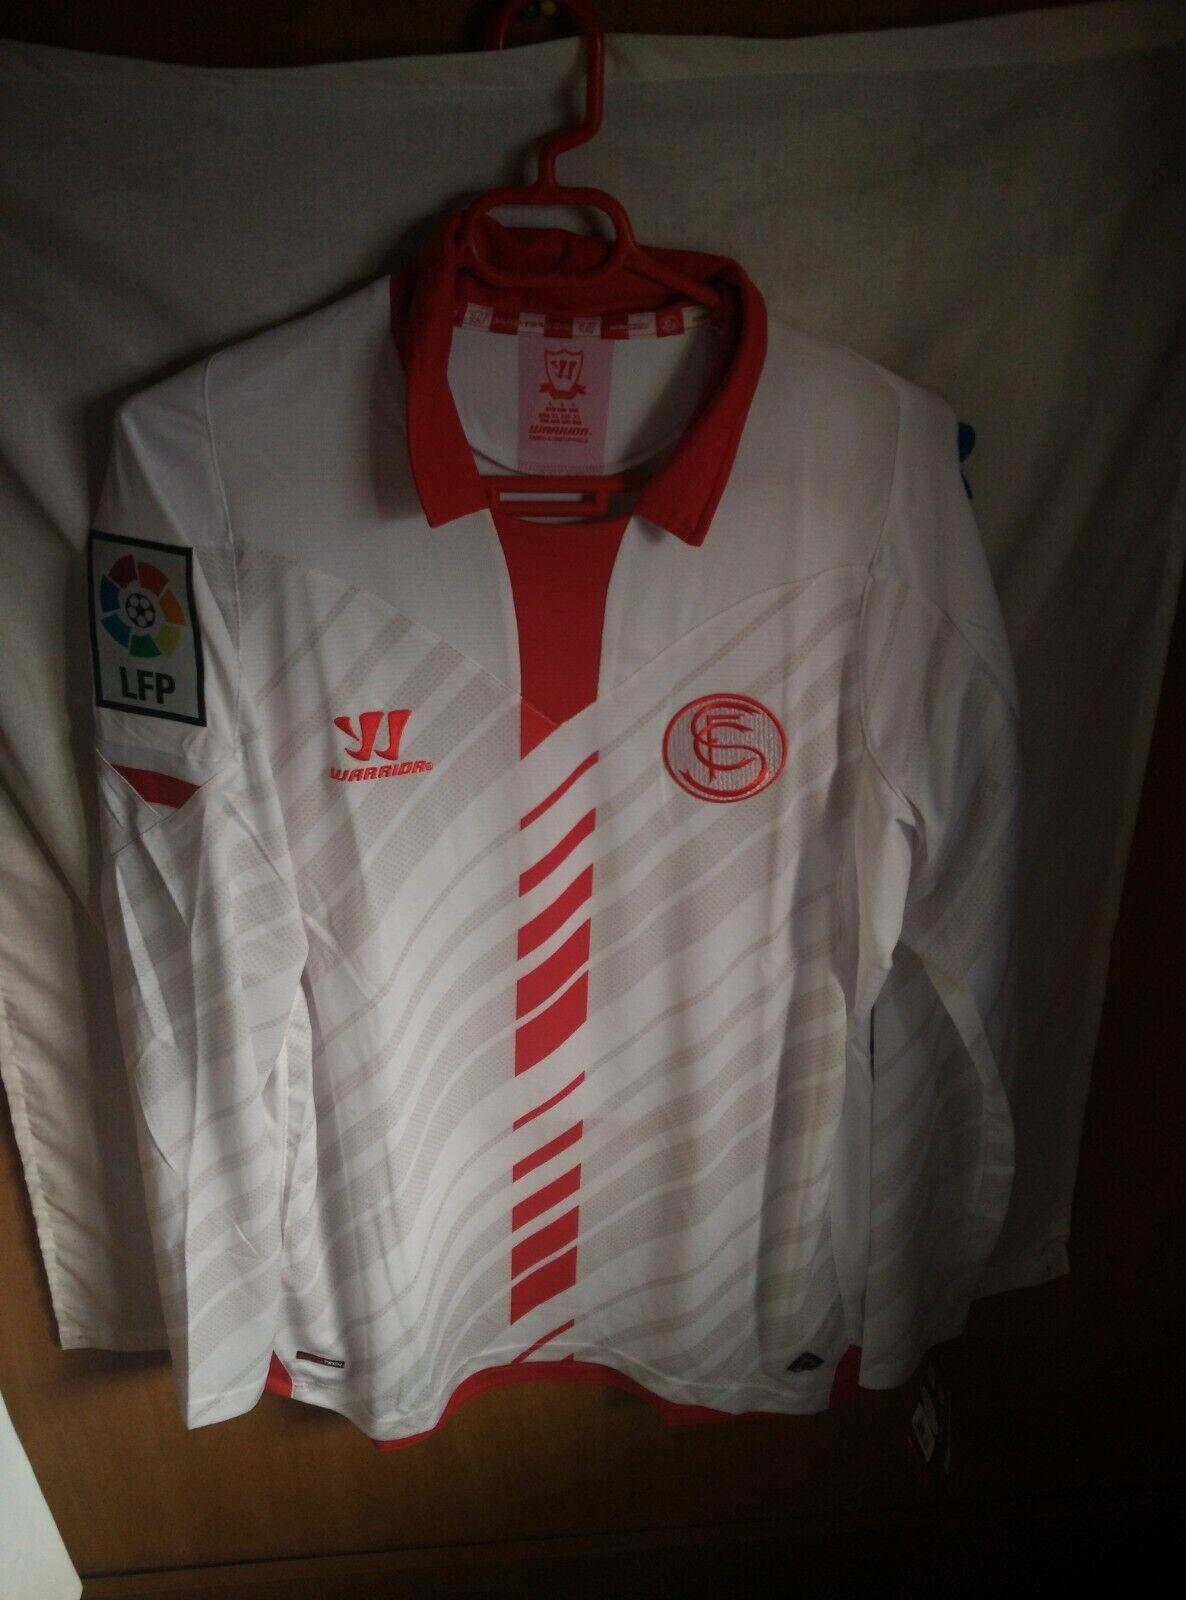 Nueva a estrenar   Original   Camiseta futbol   Dimensione L   Sevilla FC